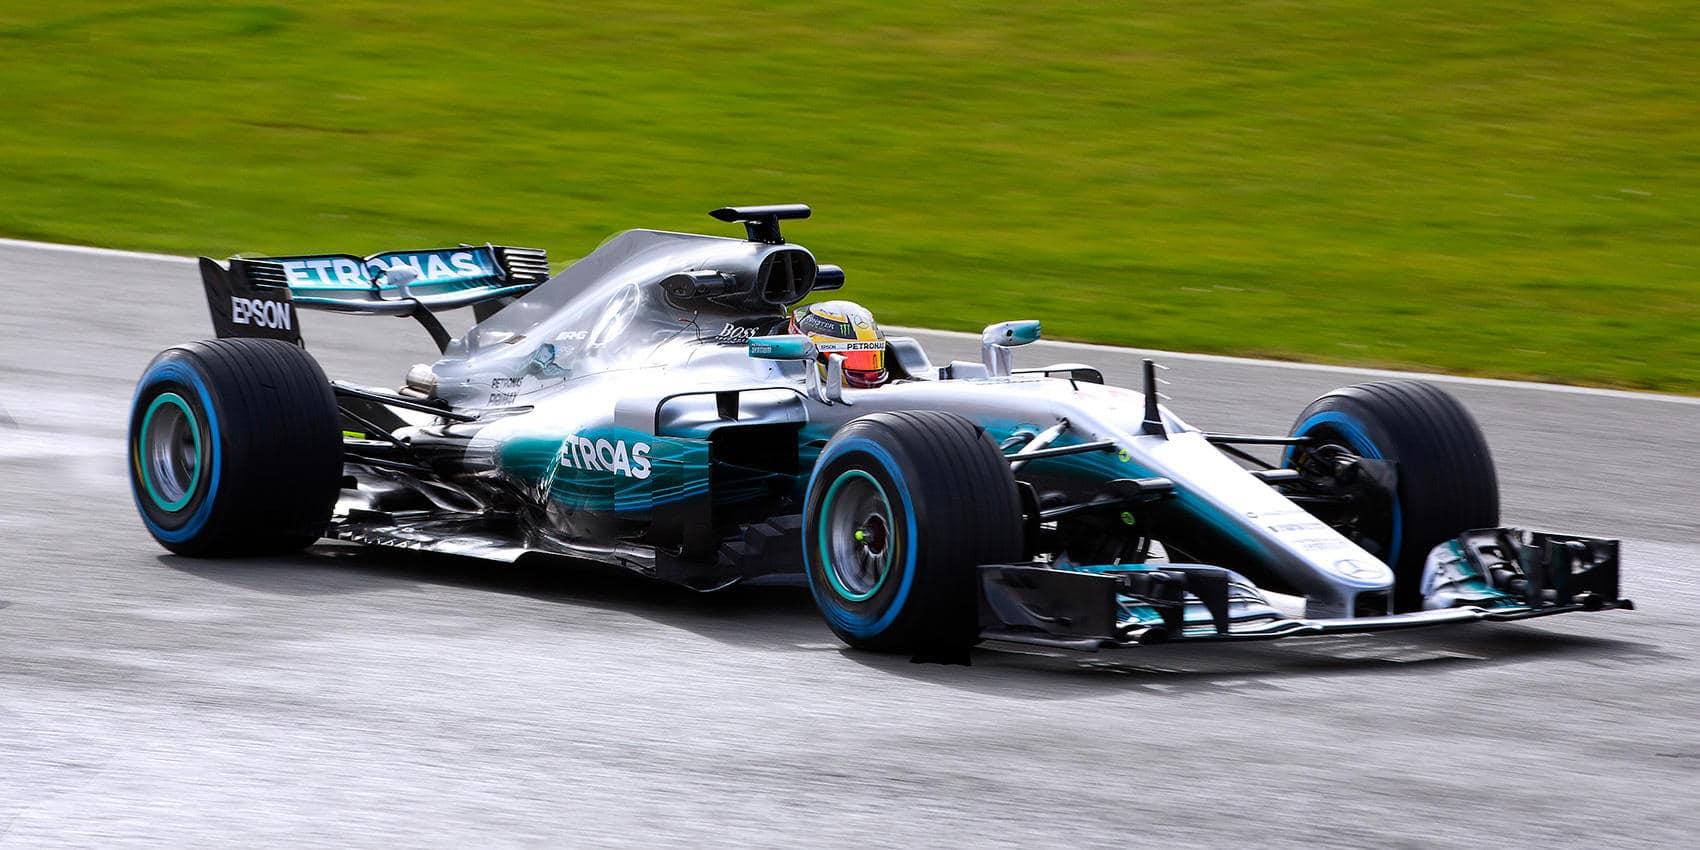 2017 Mercedes-AMG Petronas F1 Car On Track Photos - W08